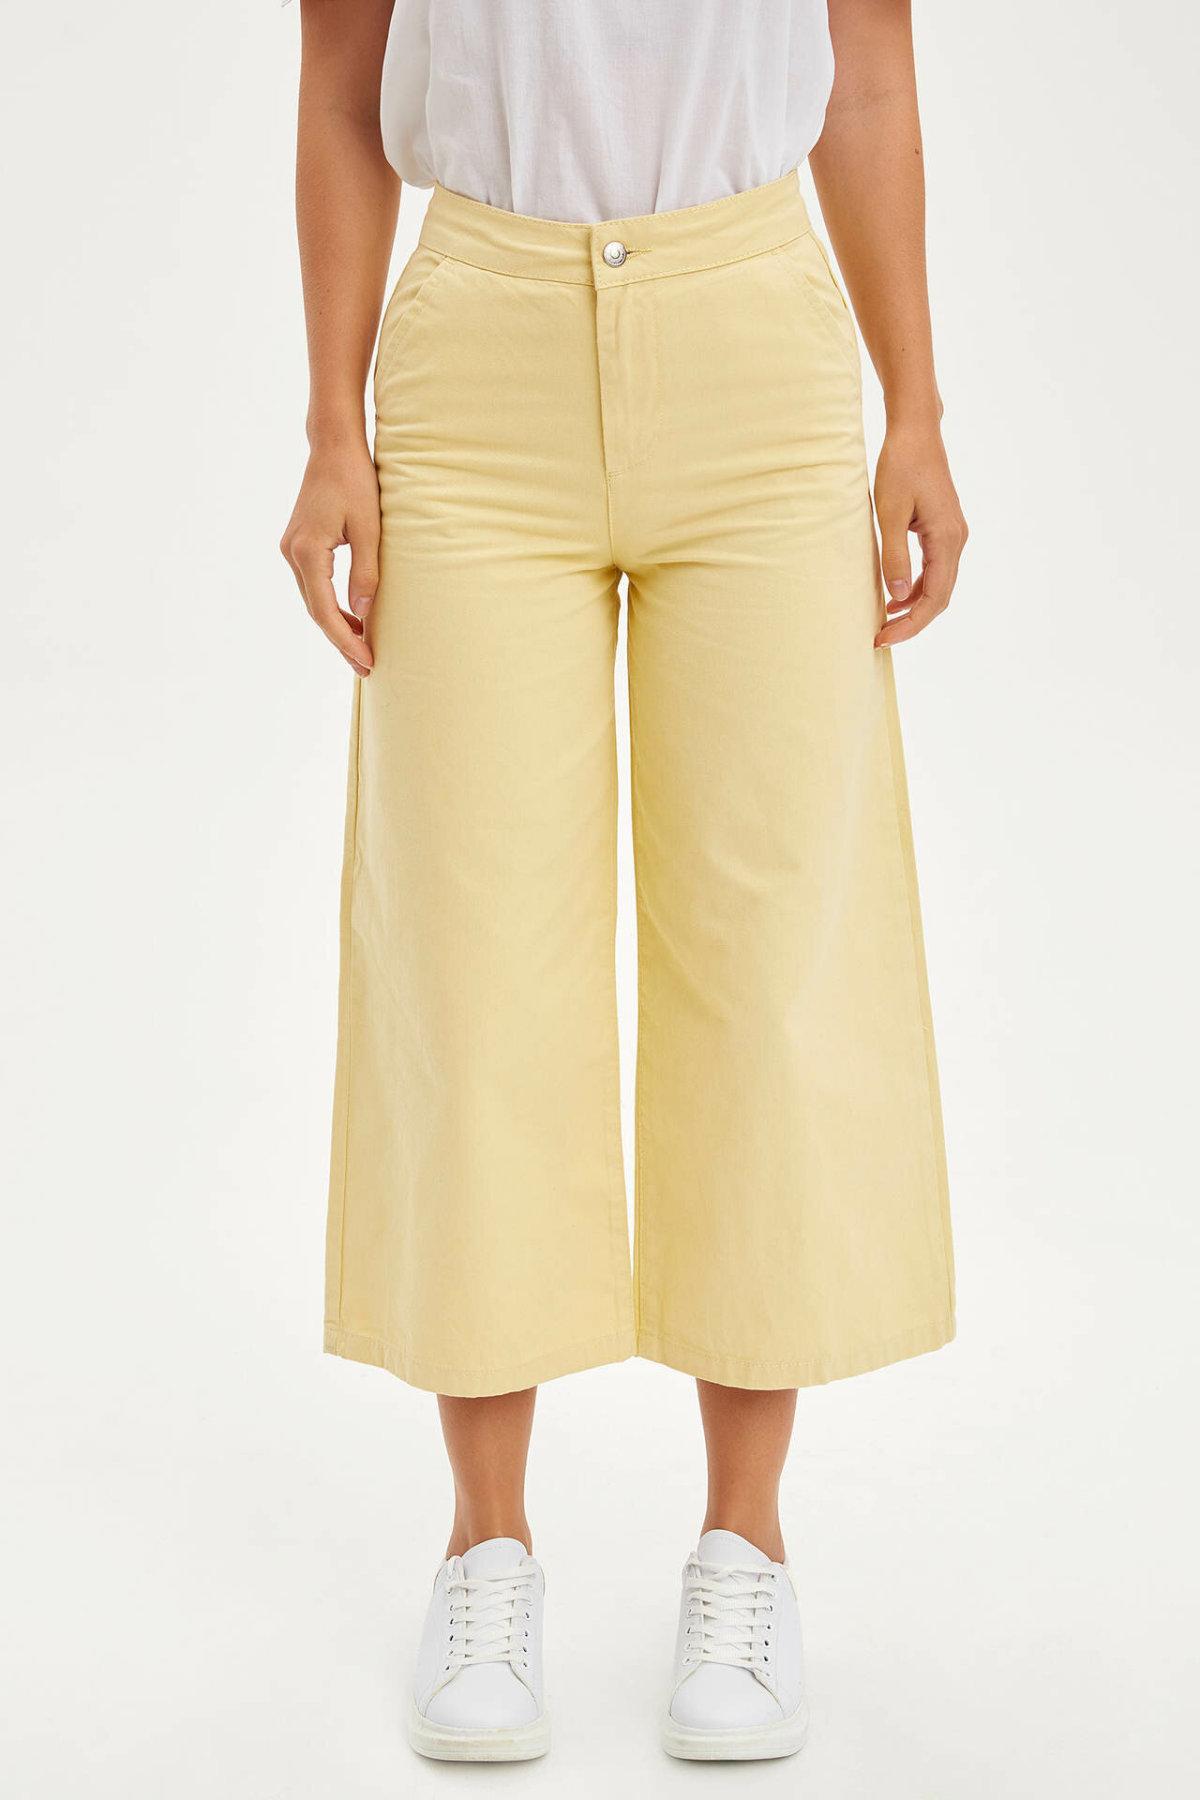 DeFacto Woman Spring Light Yellow Wide-leg Pants Women Casual Loose Ninth Pants Female Mid-waist Trousers-L8885AZ19HS